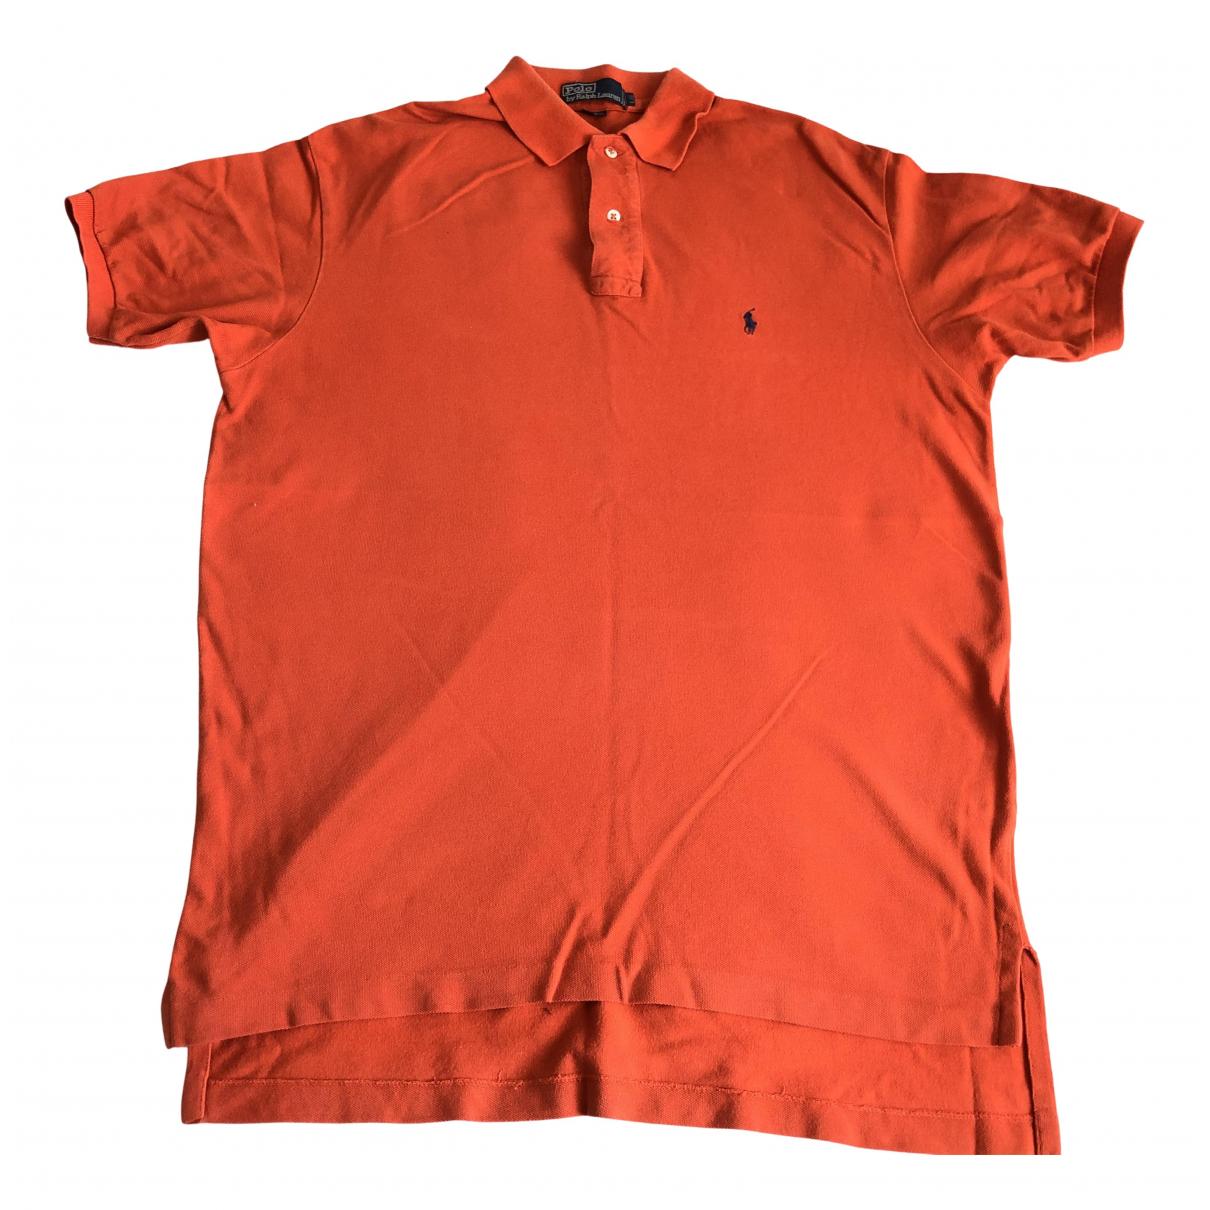 Polo Ralph Lauren - Polos Polo ajuste manches courtes pour homme en coton - orange